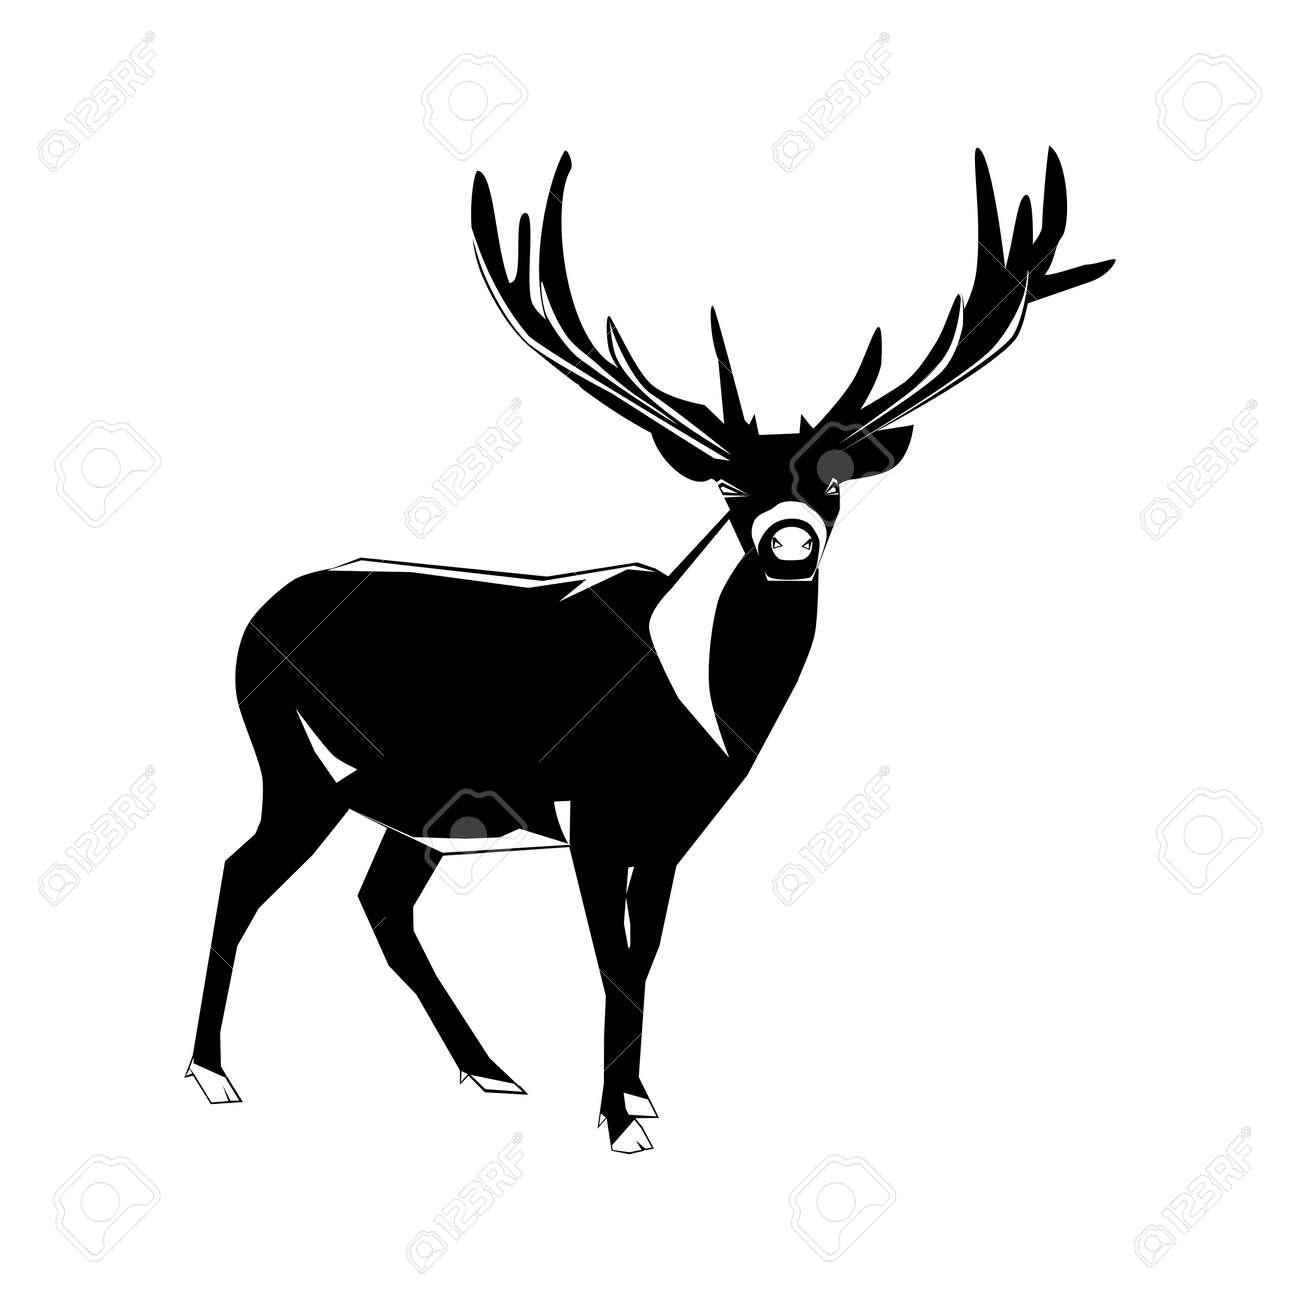 silhouette of deer isolated on white background. vector illustration eps - 157218316